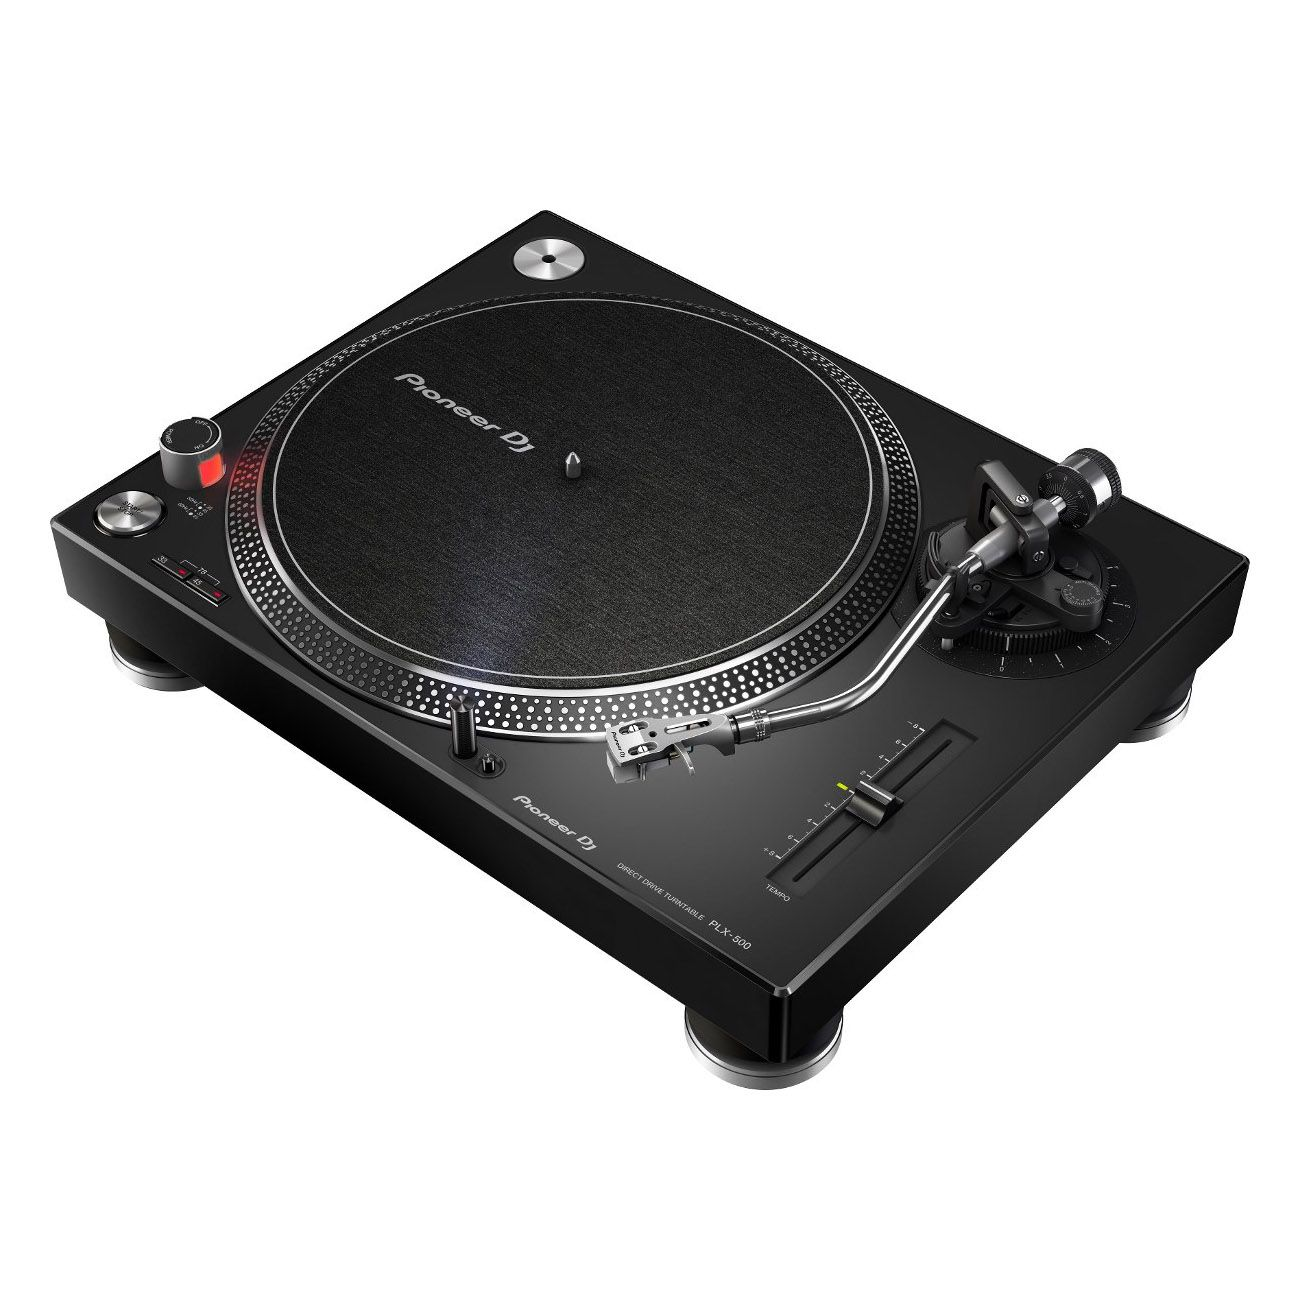 Toca Disco Pioneer Plx 500 K